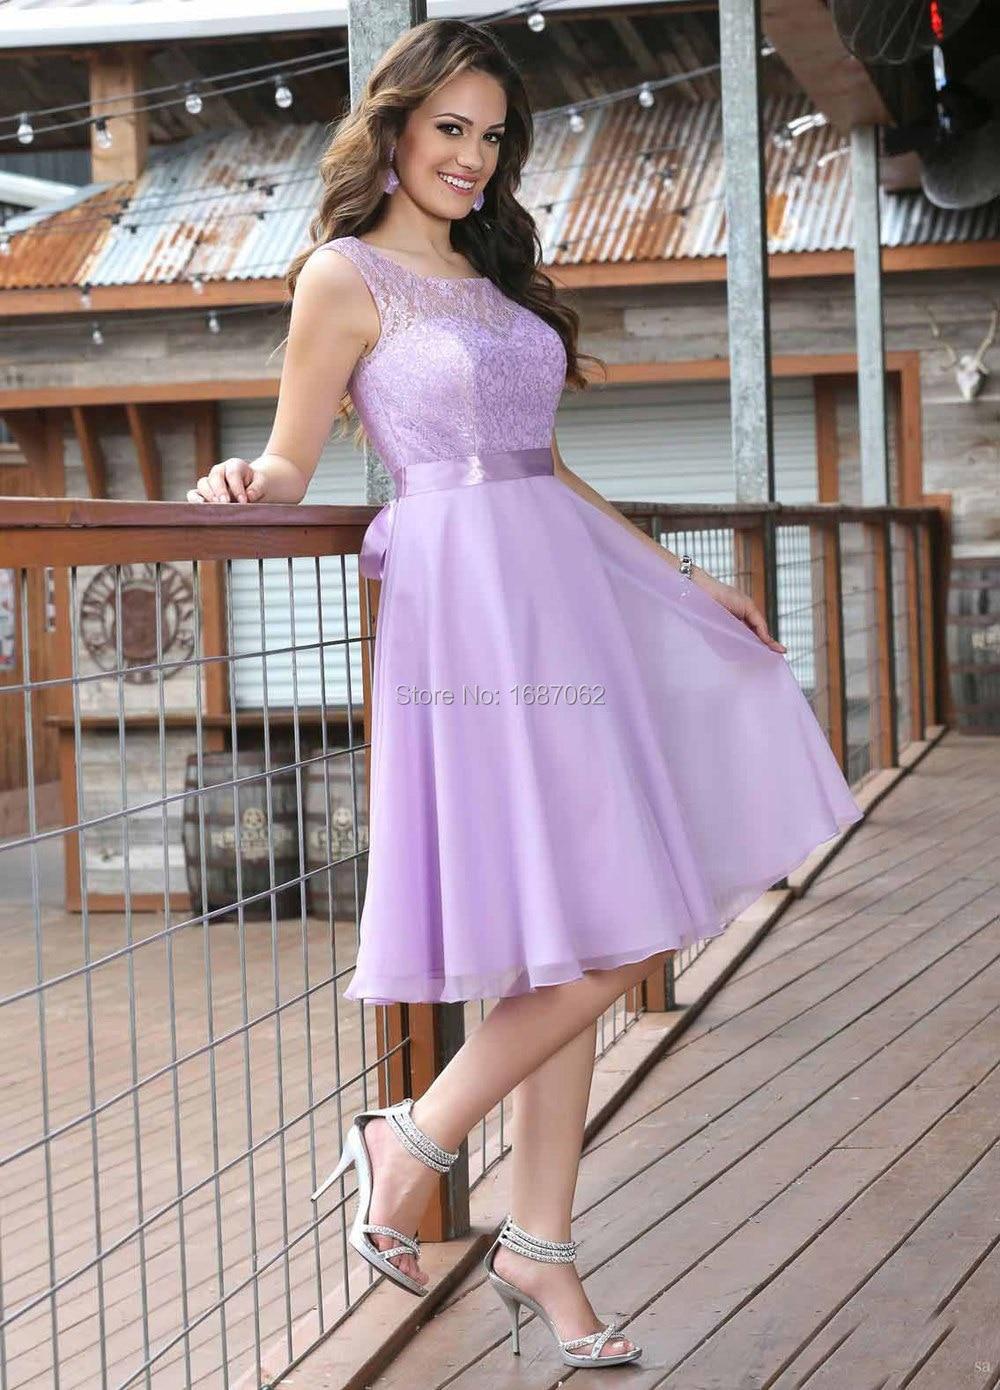 Knee Length Formal Dresses for Teens _Formal Dresses_dressesss